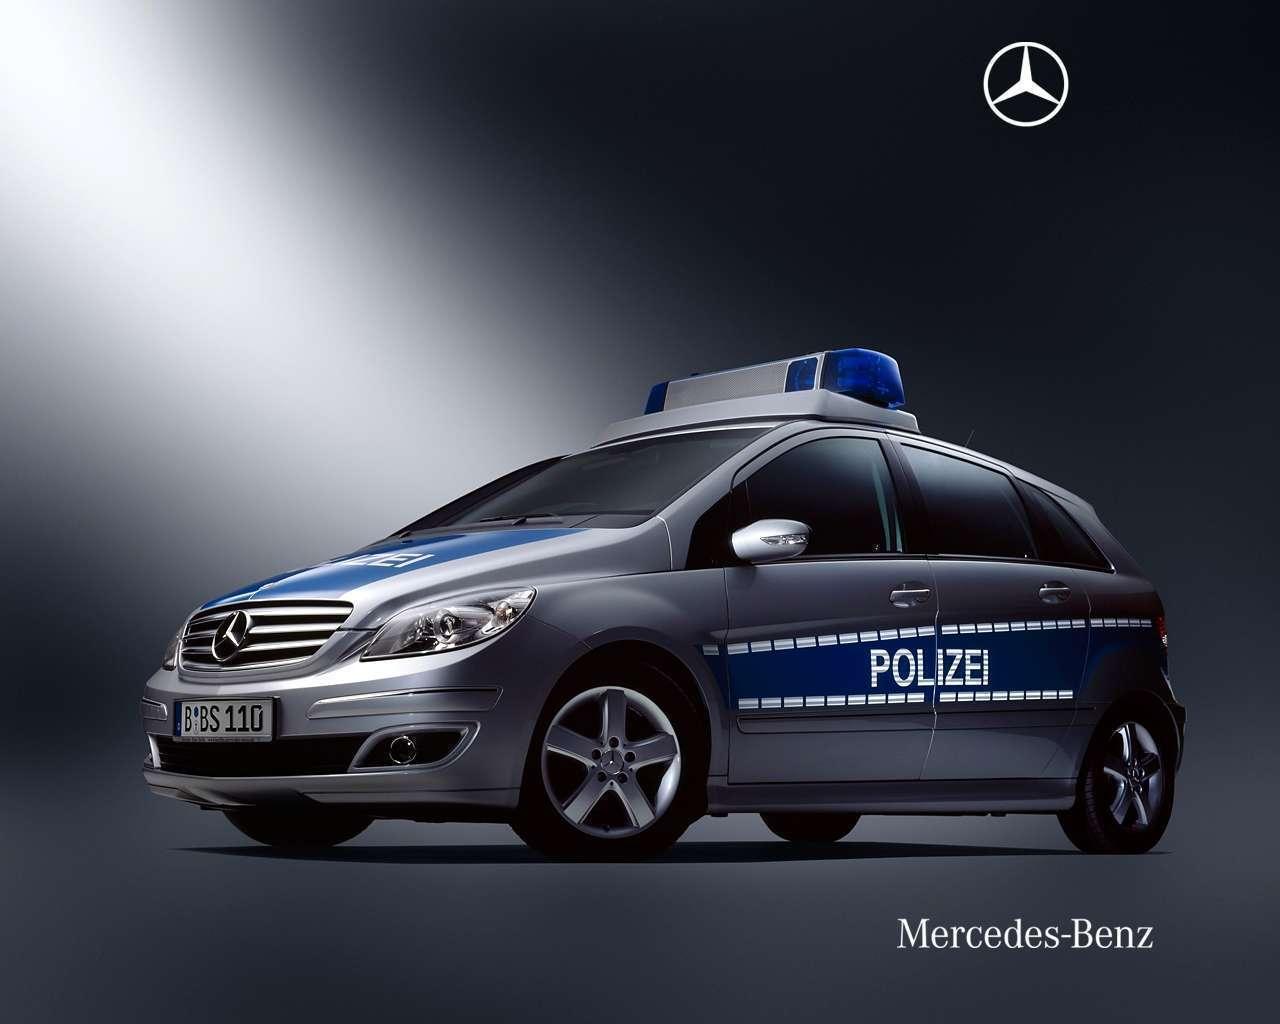 File Name german police wallpaper wallpapersjpg Resolution 230 x 1280x1024